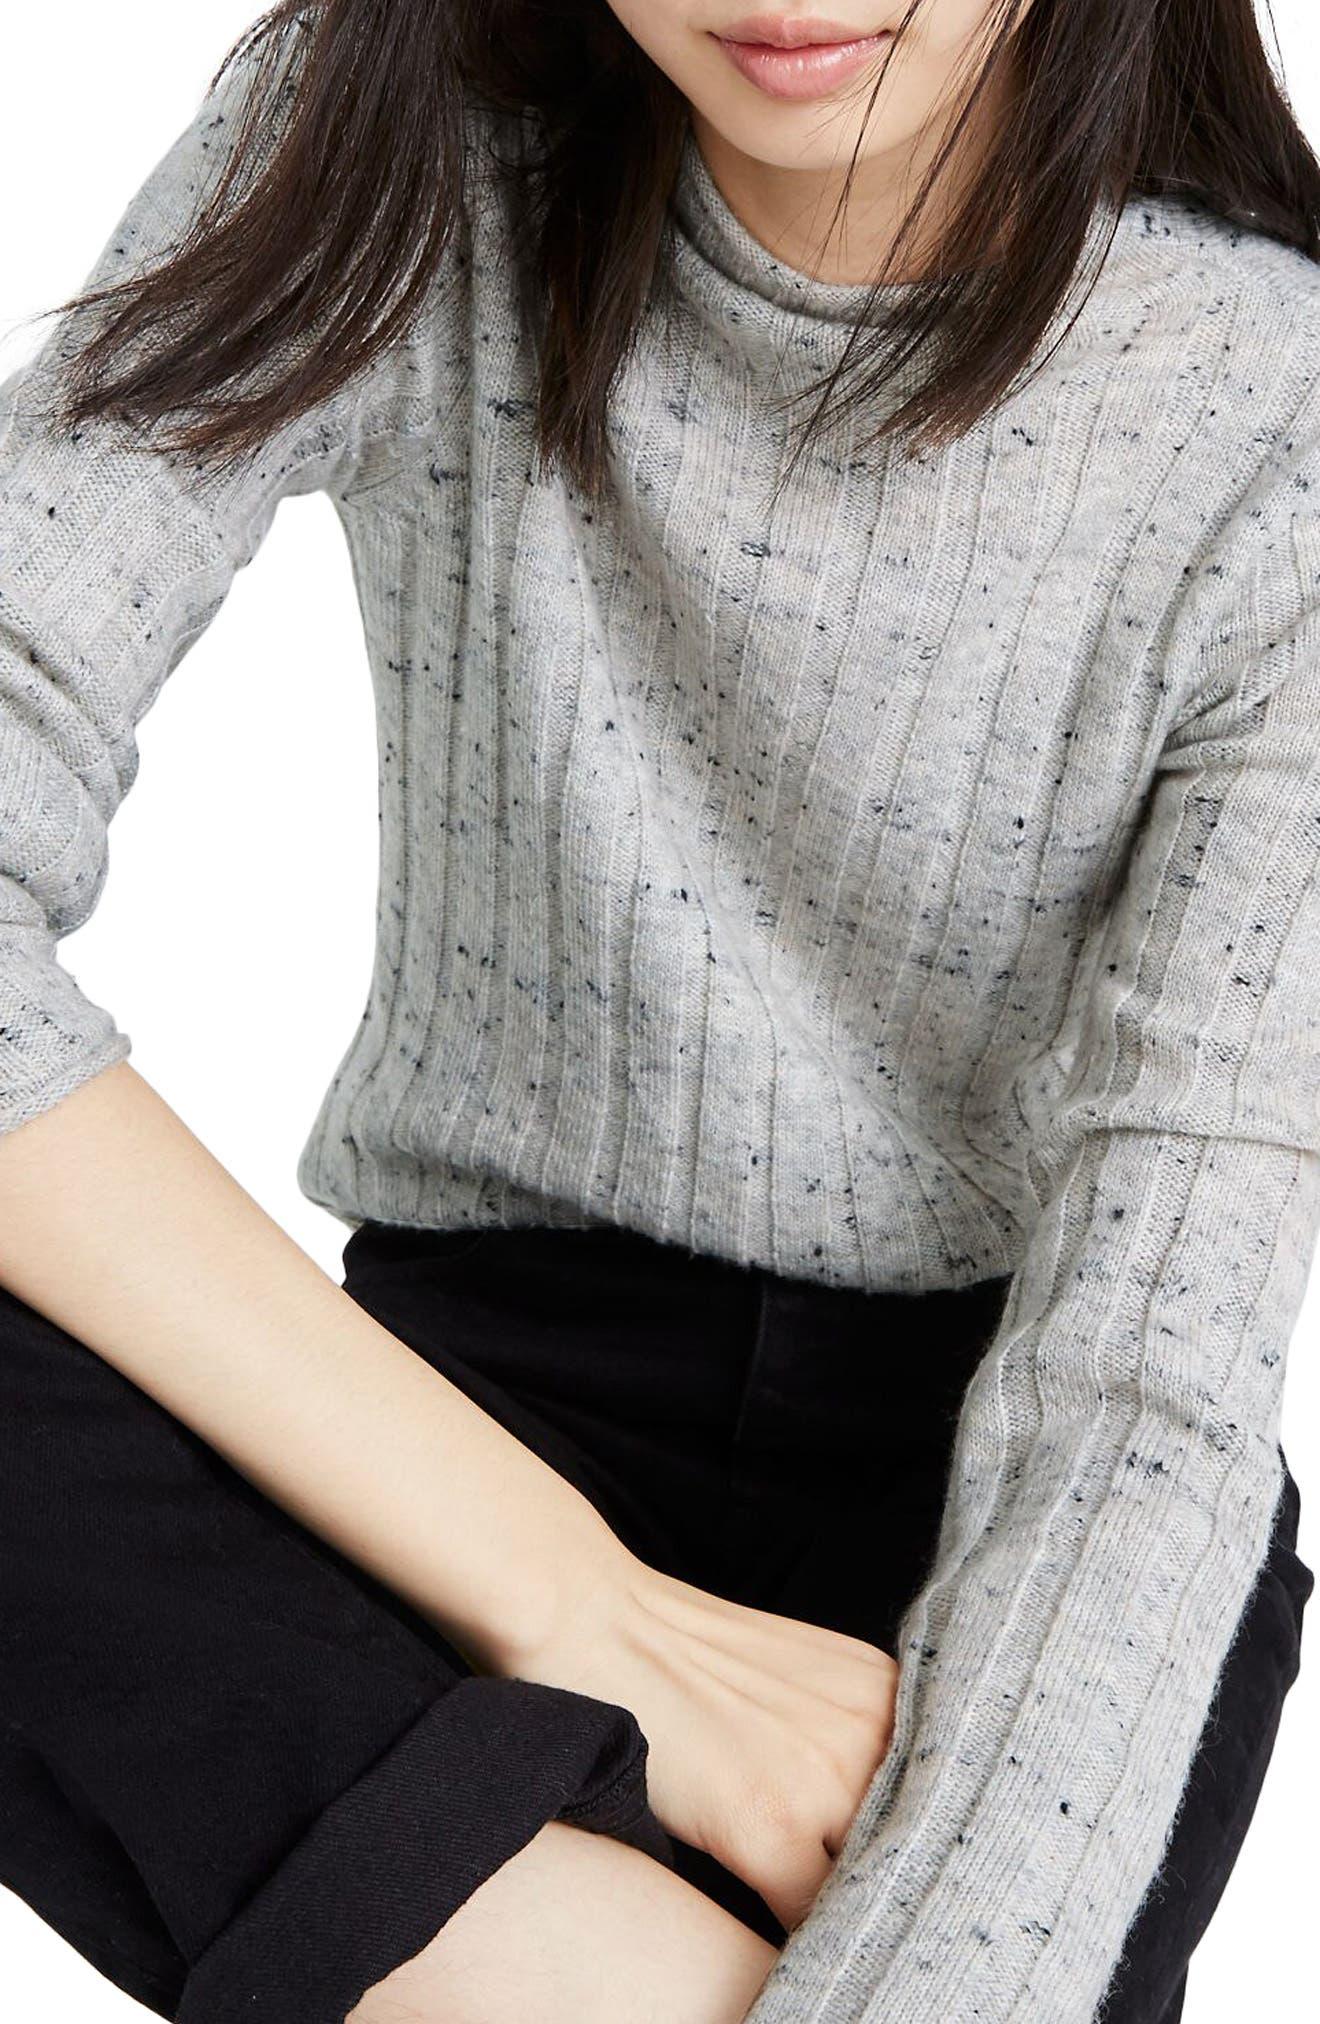 Madewell Donegal Evercrest Coziest Yarn Turtleneck Sweater (Regular & Plus Size)